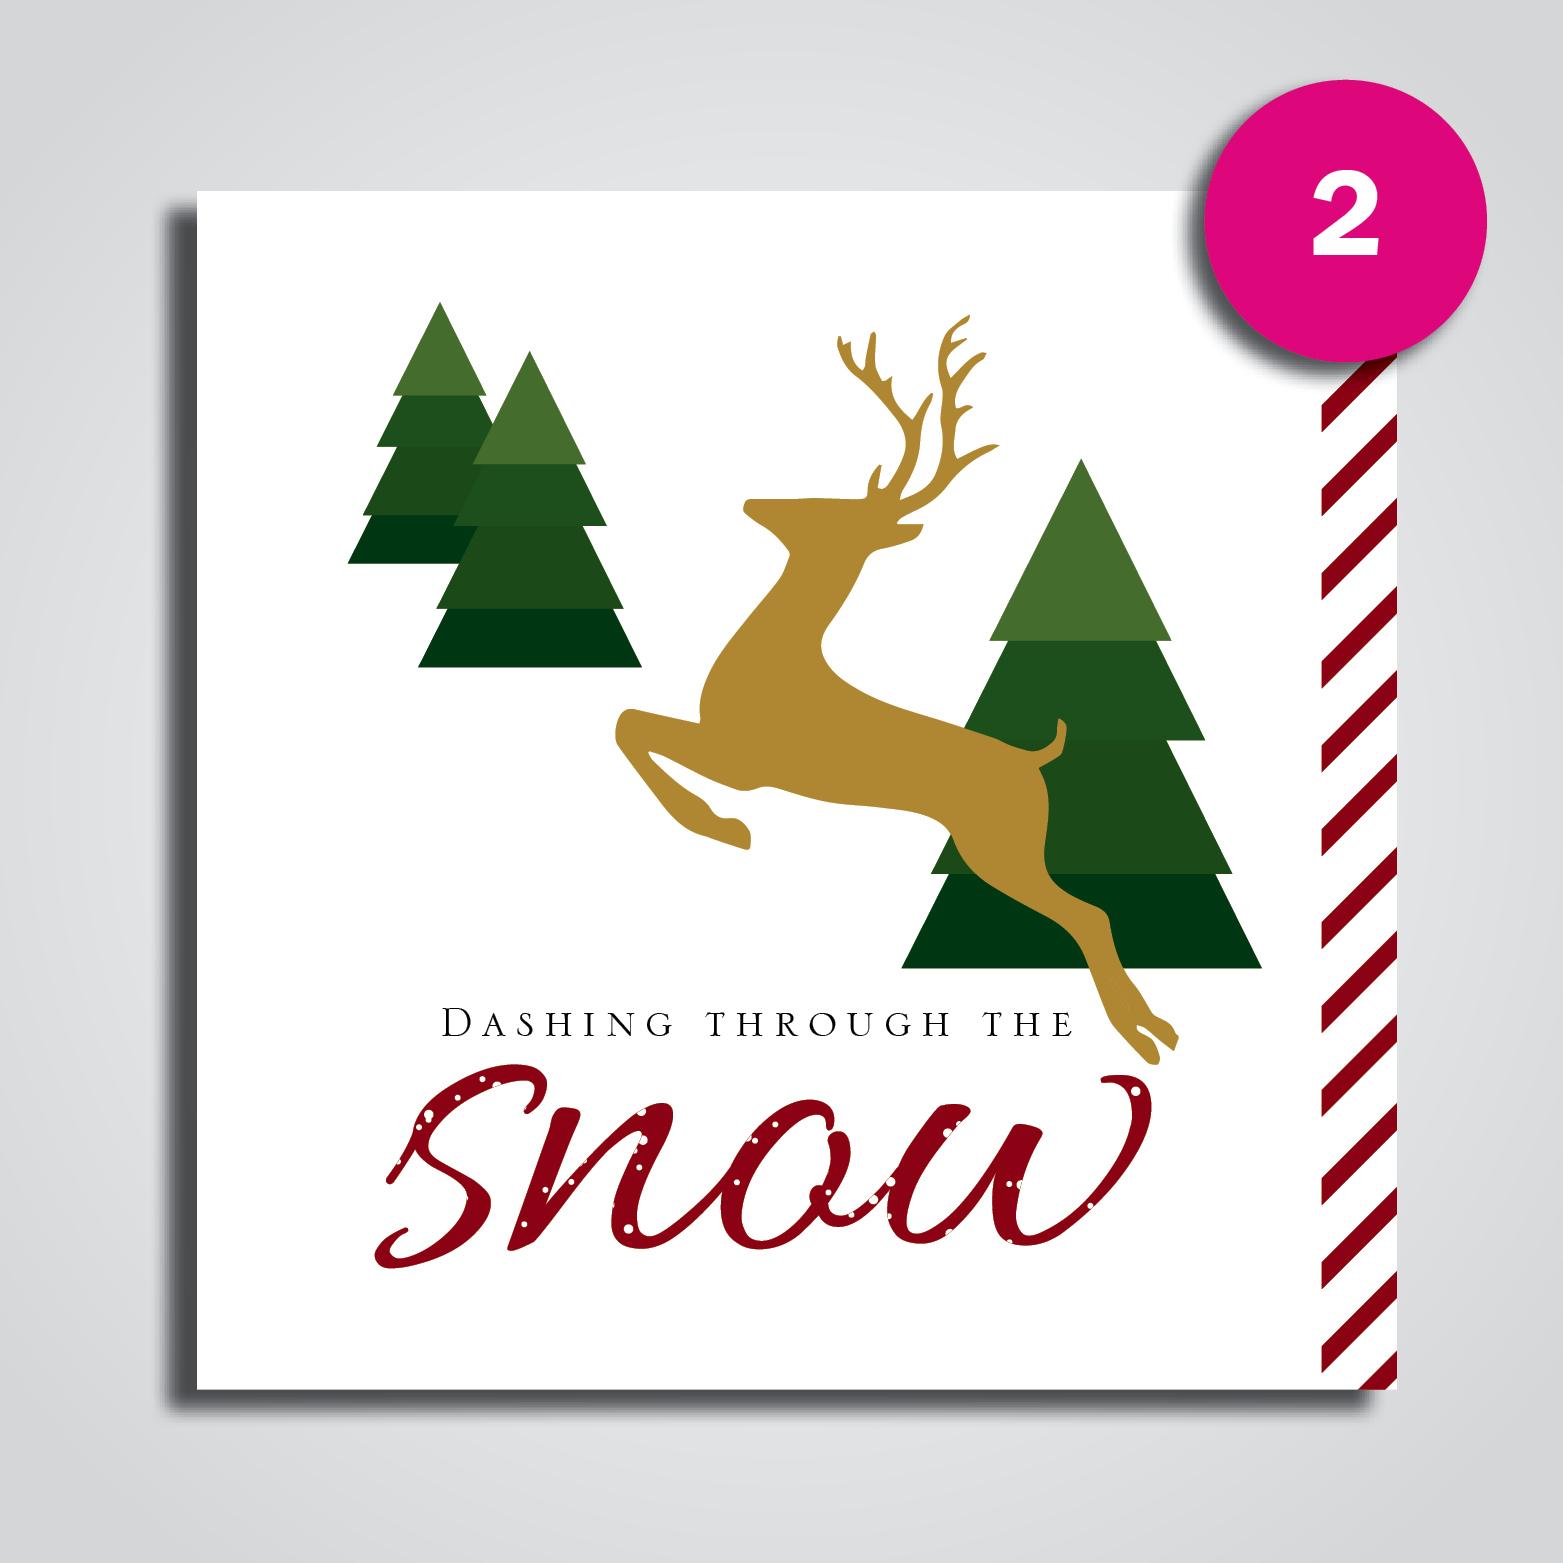 Christmas Card Designs Telford Reprographics Ltd